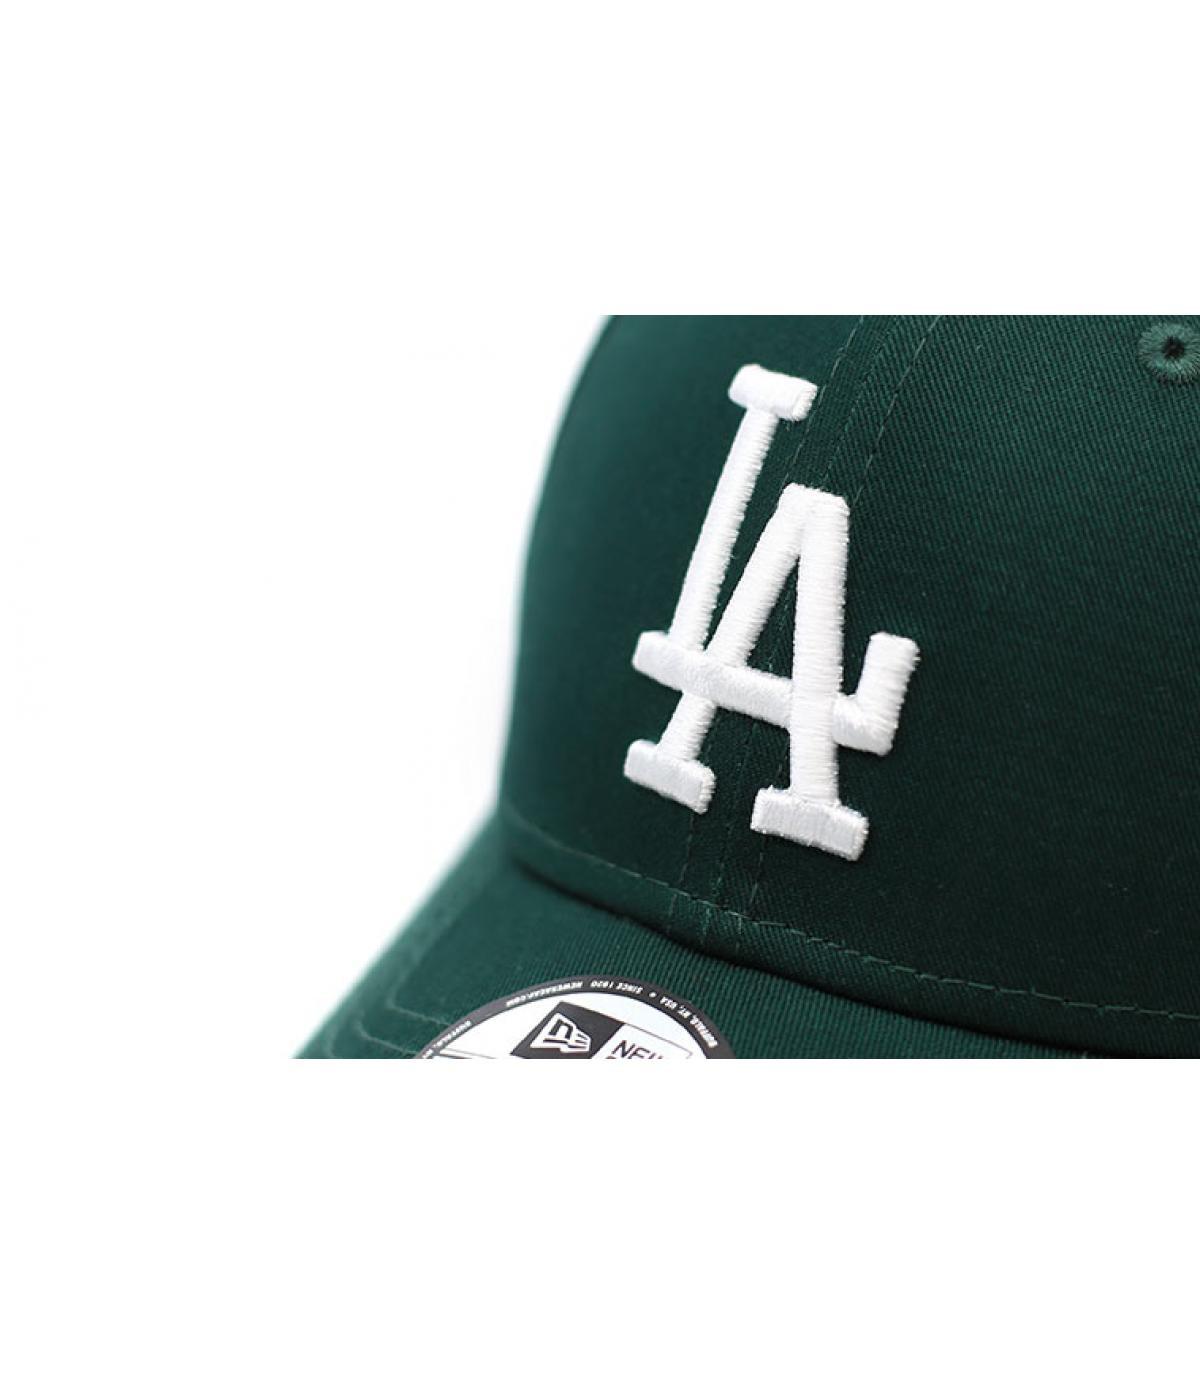 Details League Ess 9Forty LA dark green - afbeeling 3